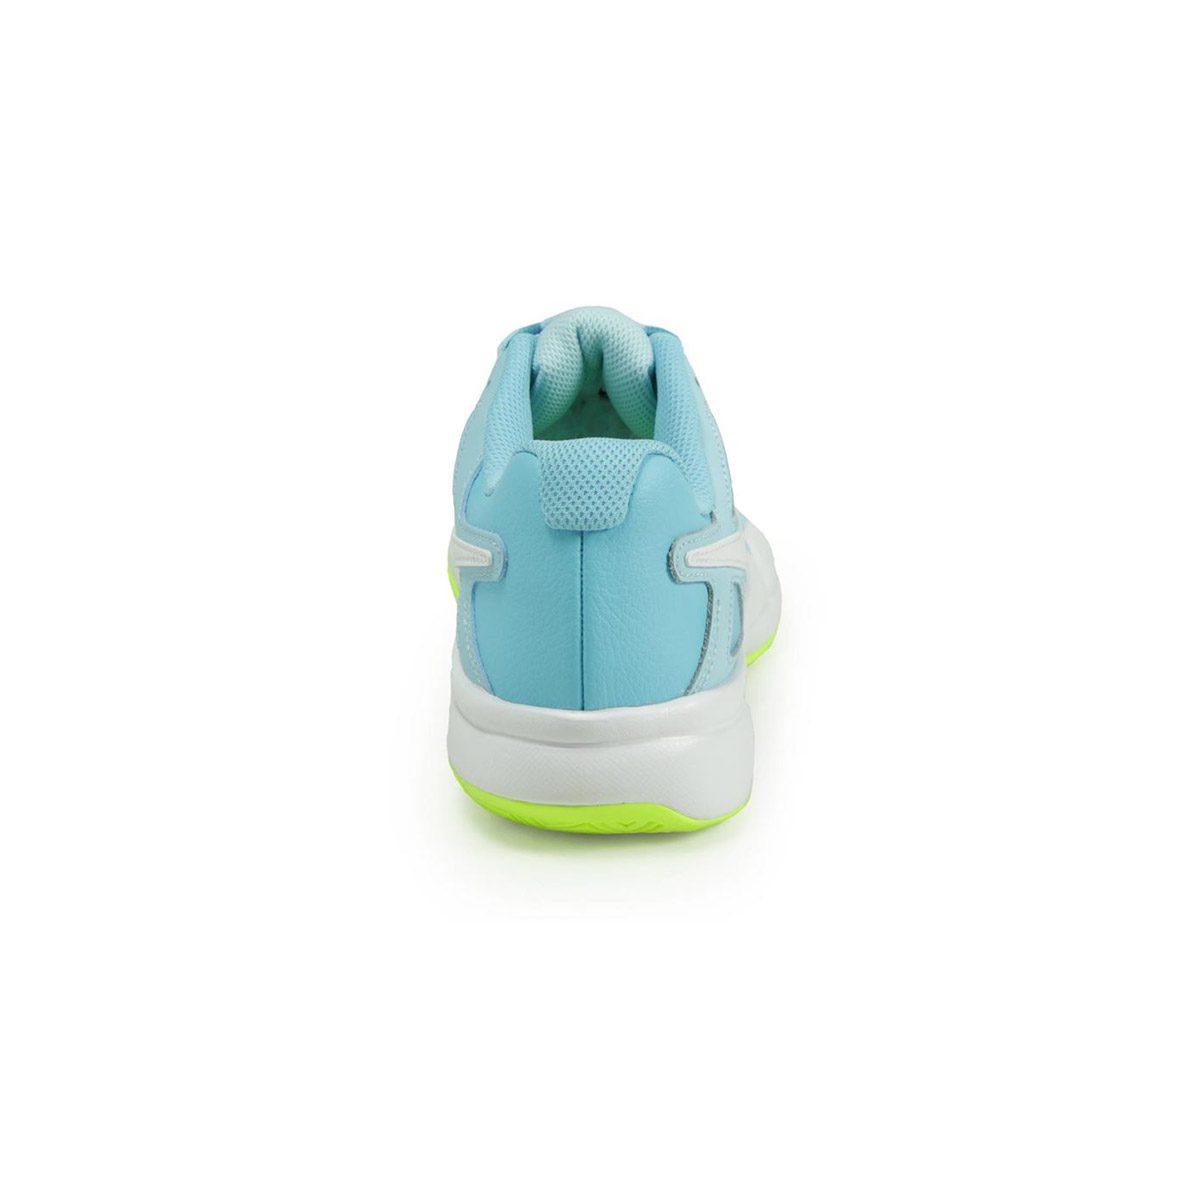 fd5f42932df Nike Air Vapor Advantage Women s Shoes - Light Aqua - Peake ...